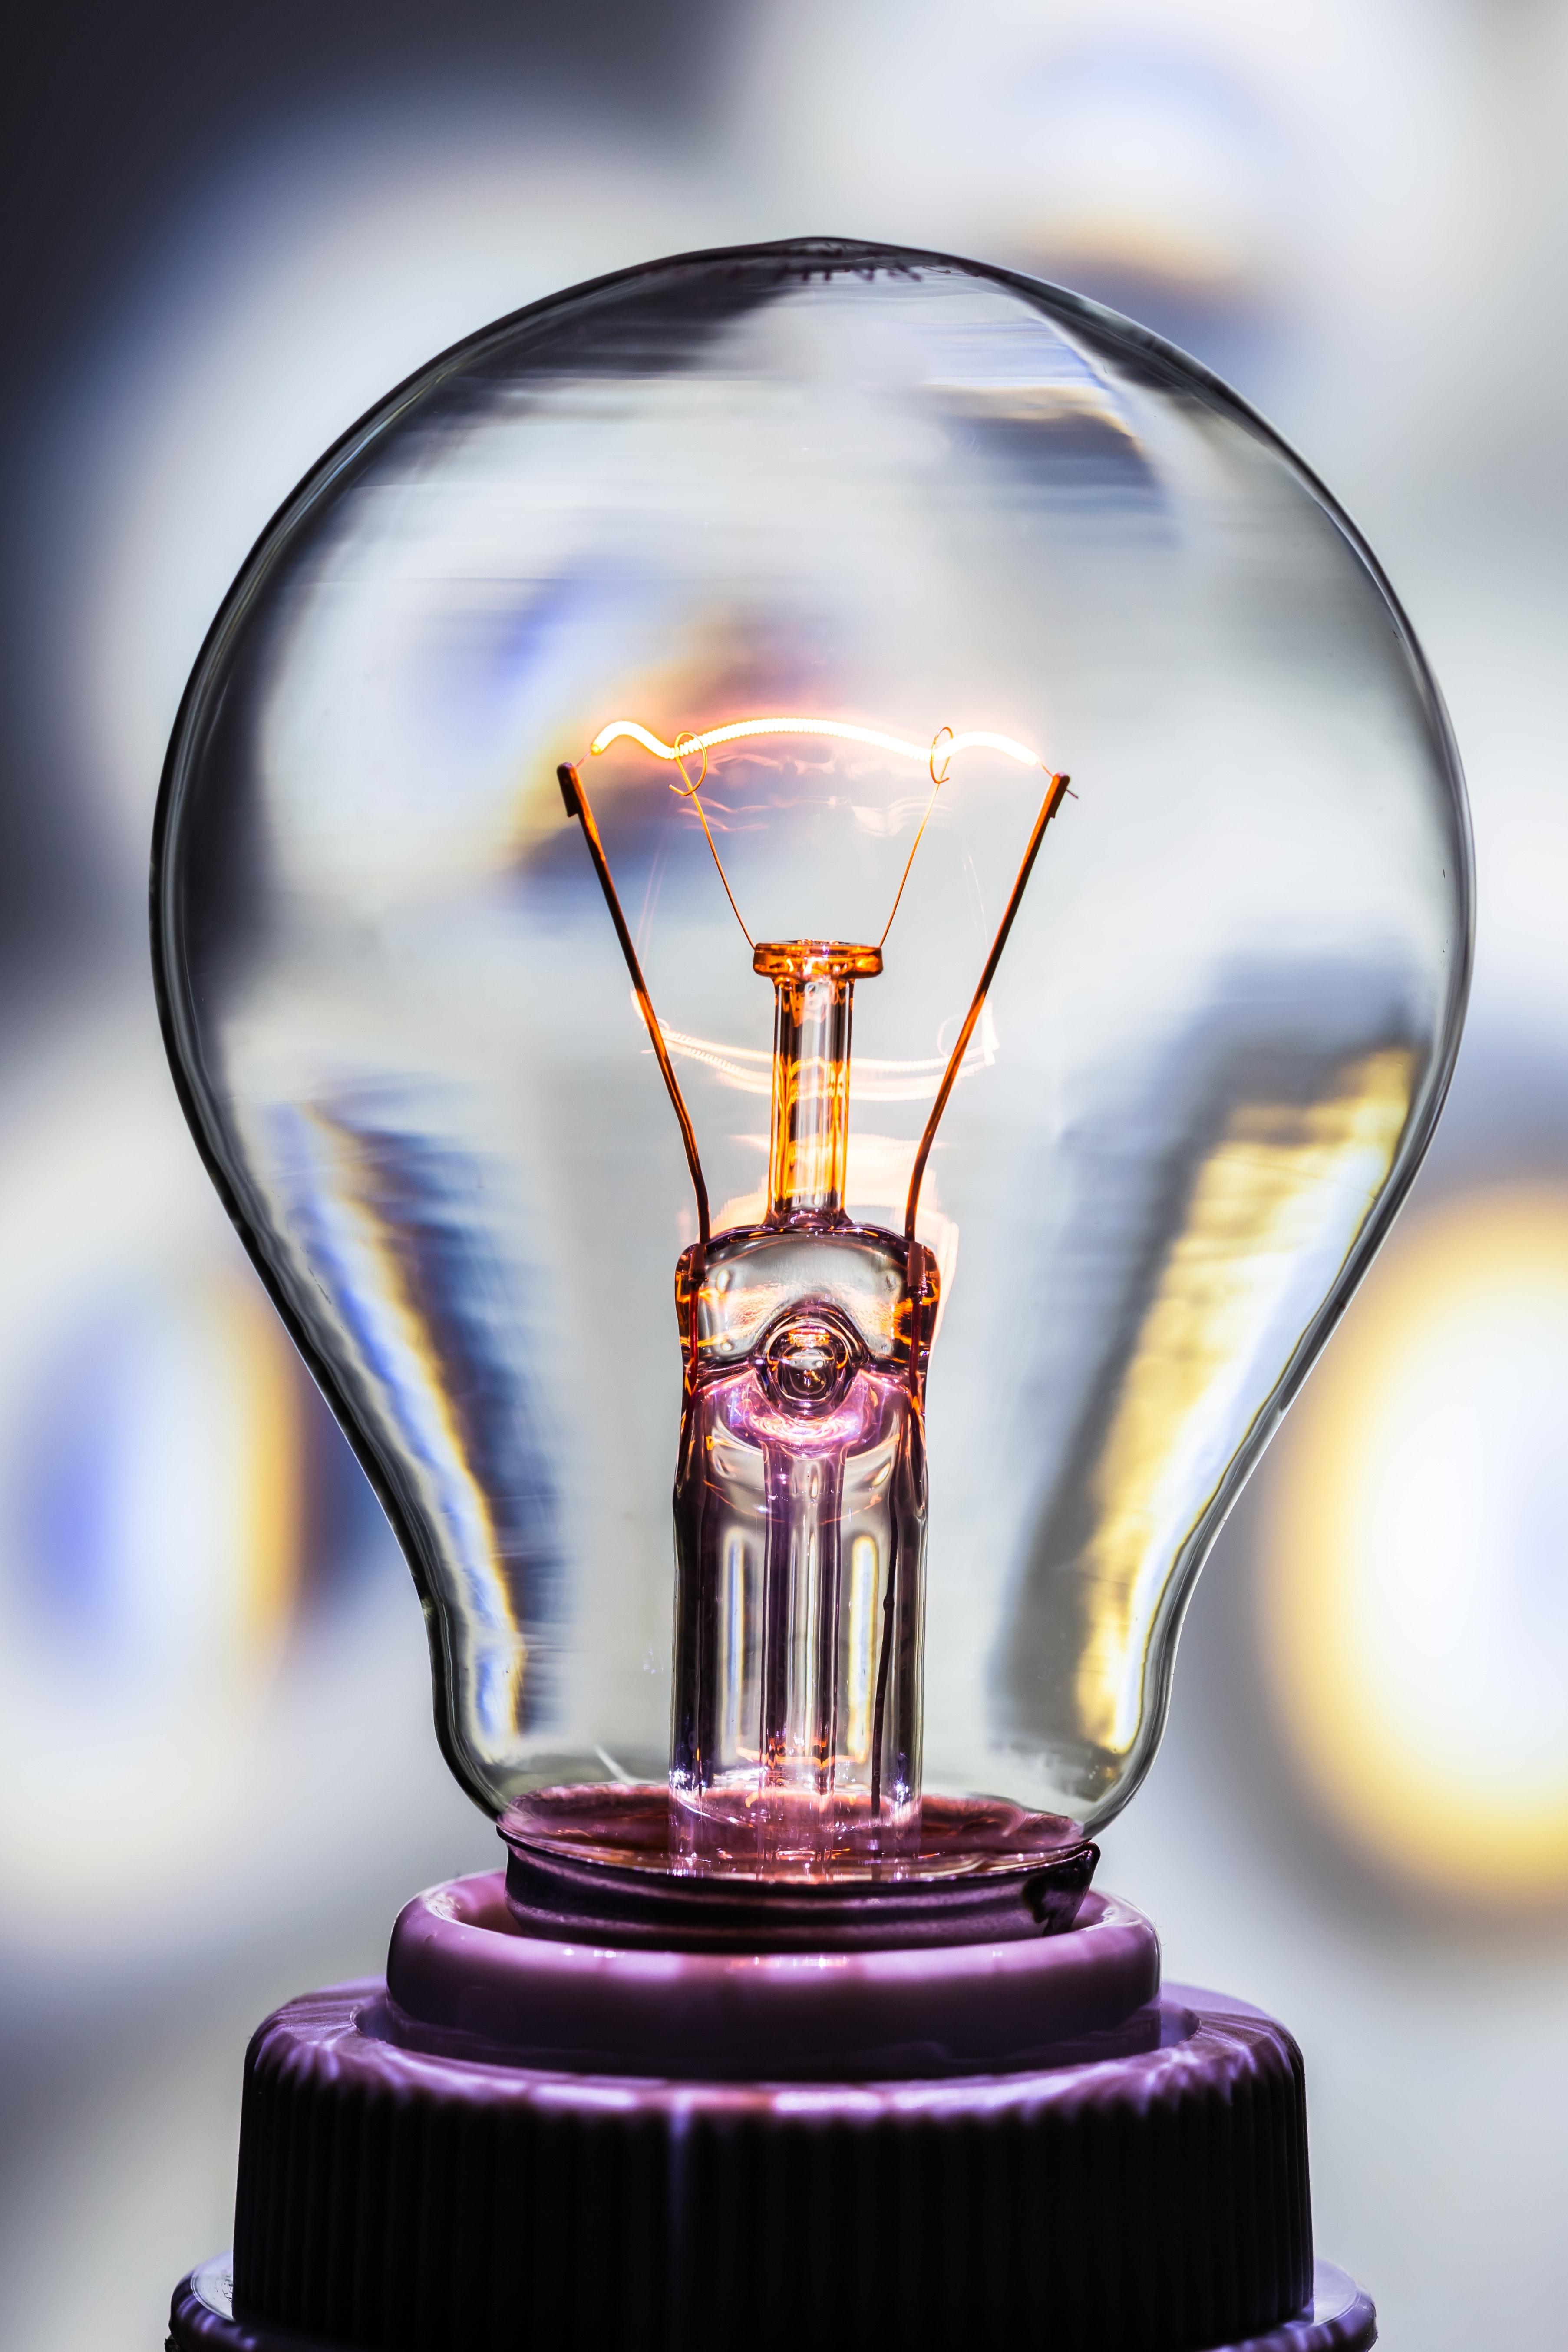 The CEC Announces New Electrical Apprenticeship Program